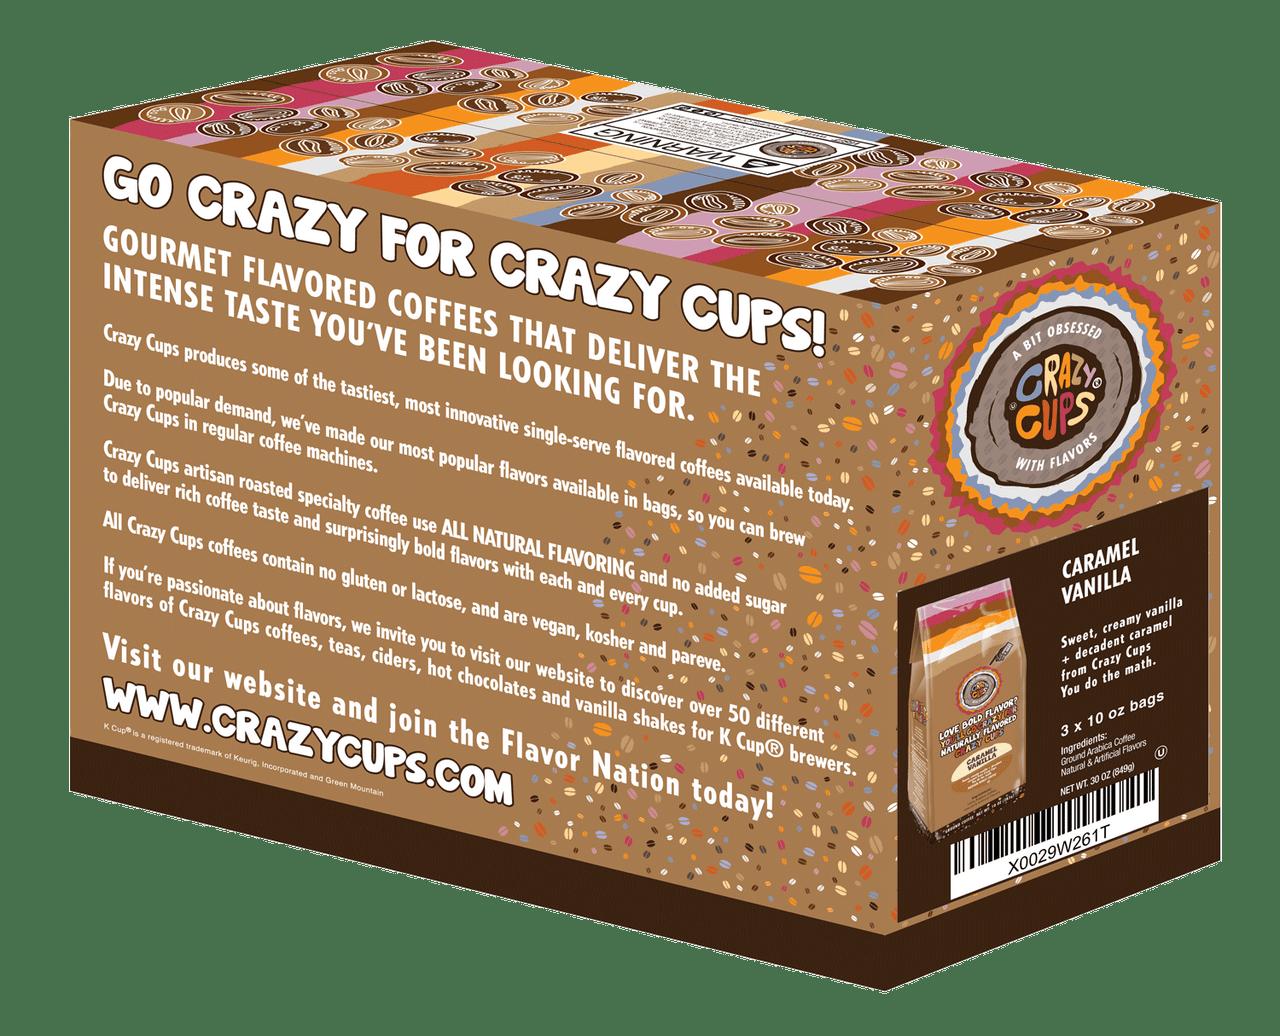 Caramel Vanilla Ground Coffee By Crazy Cups